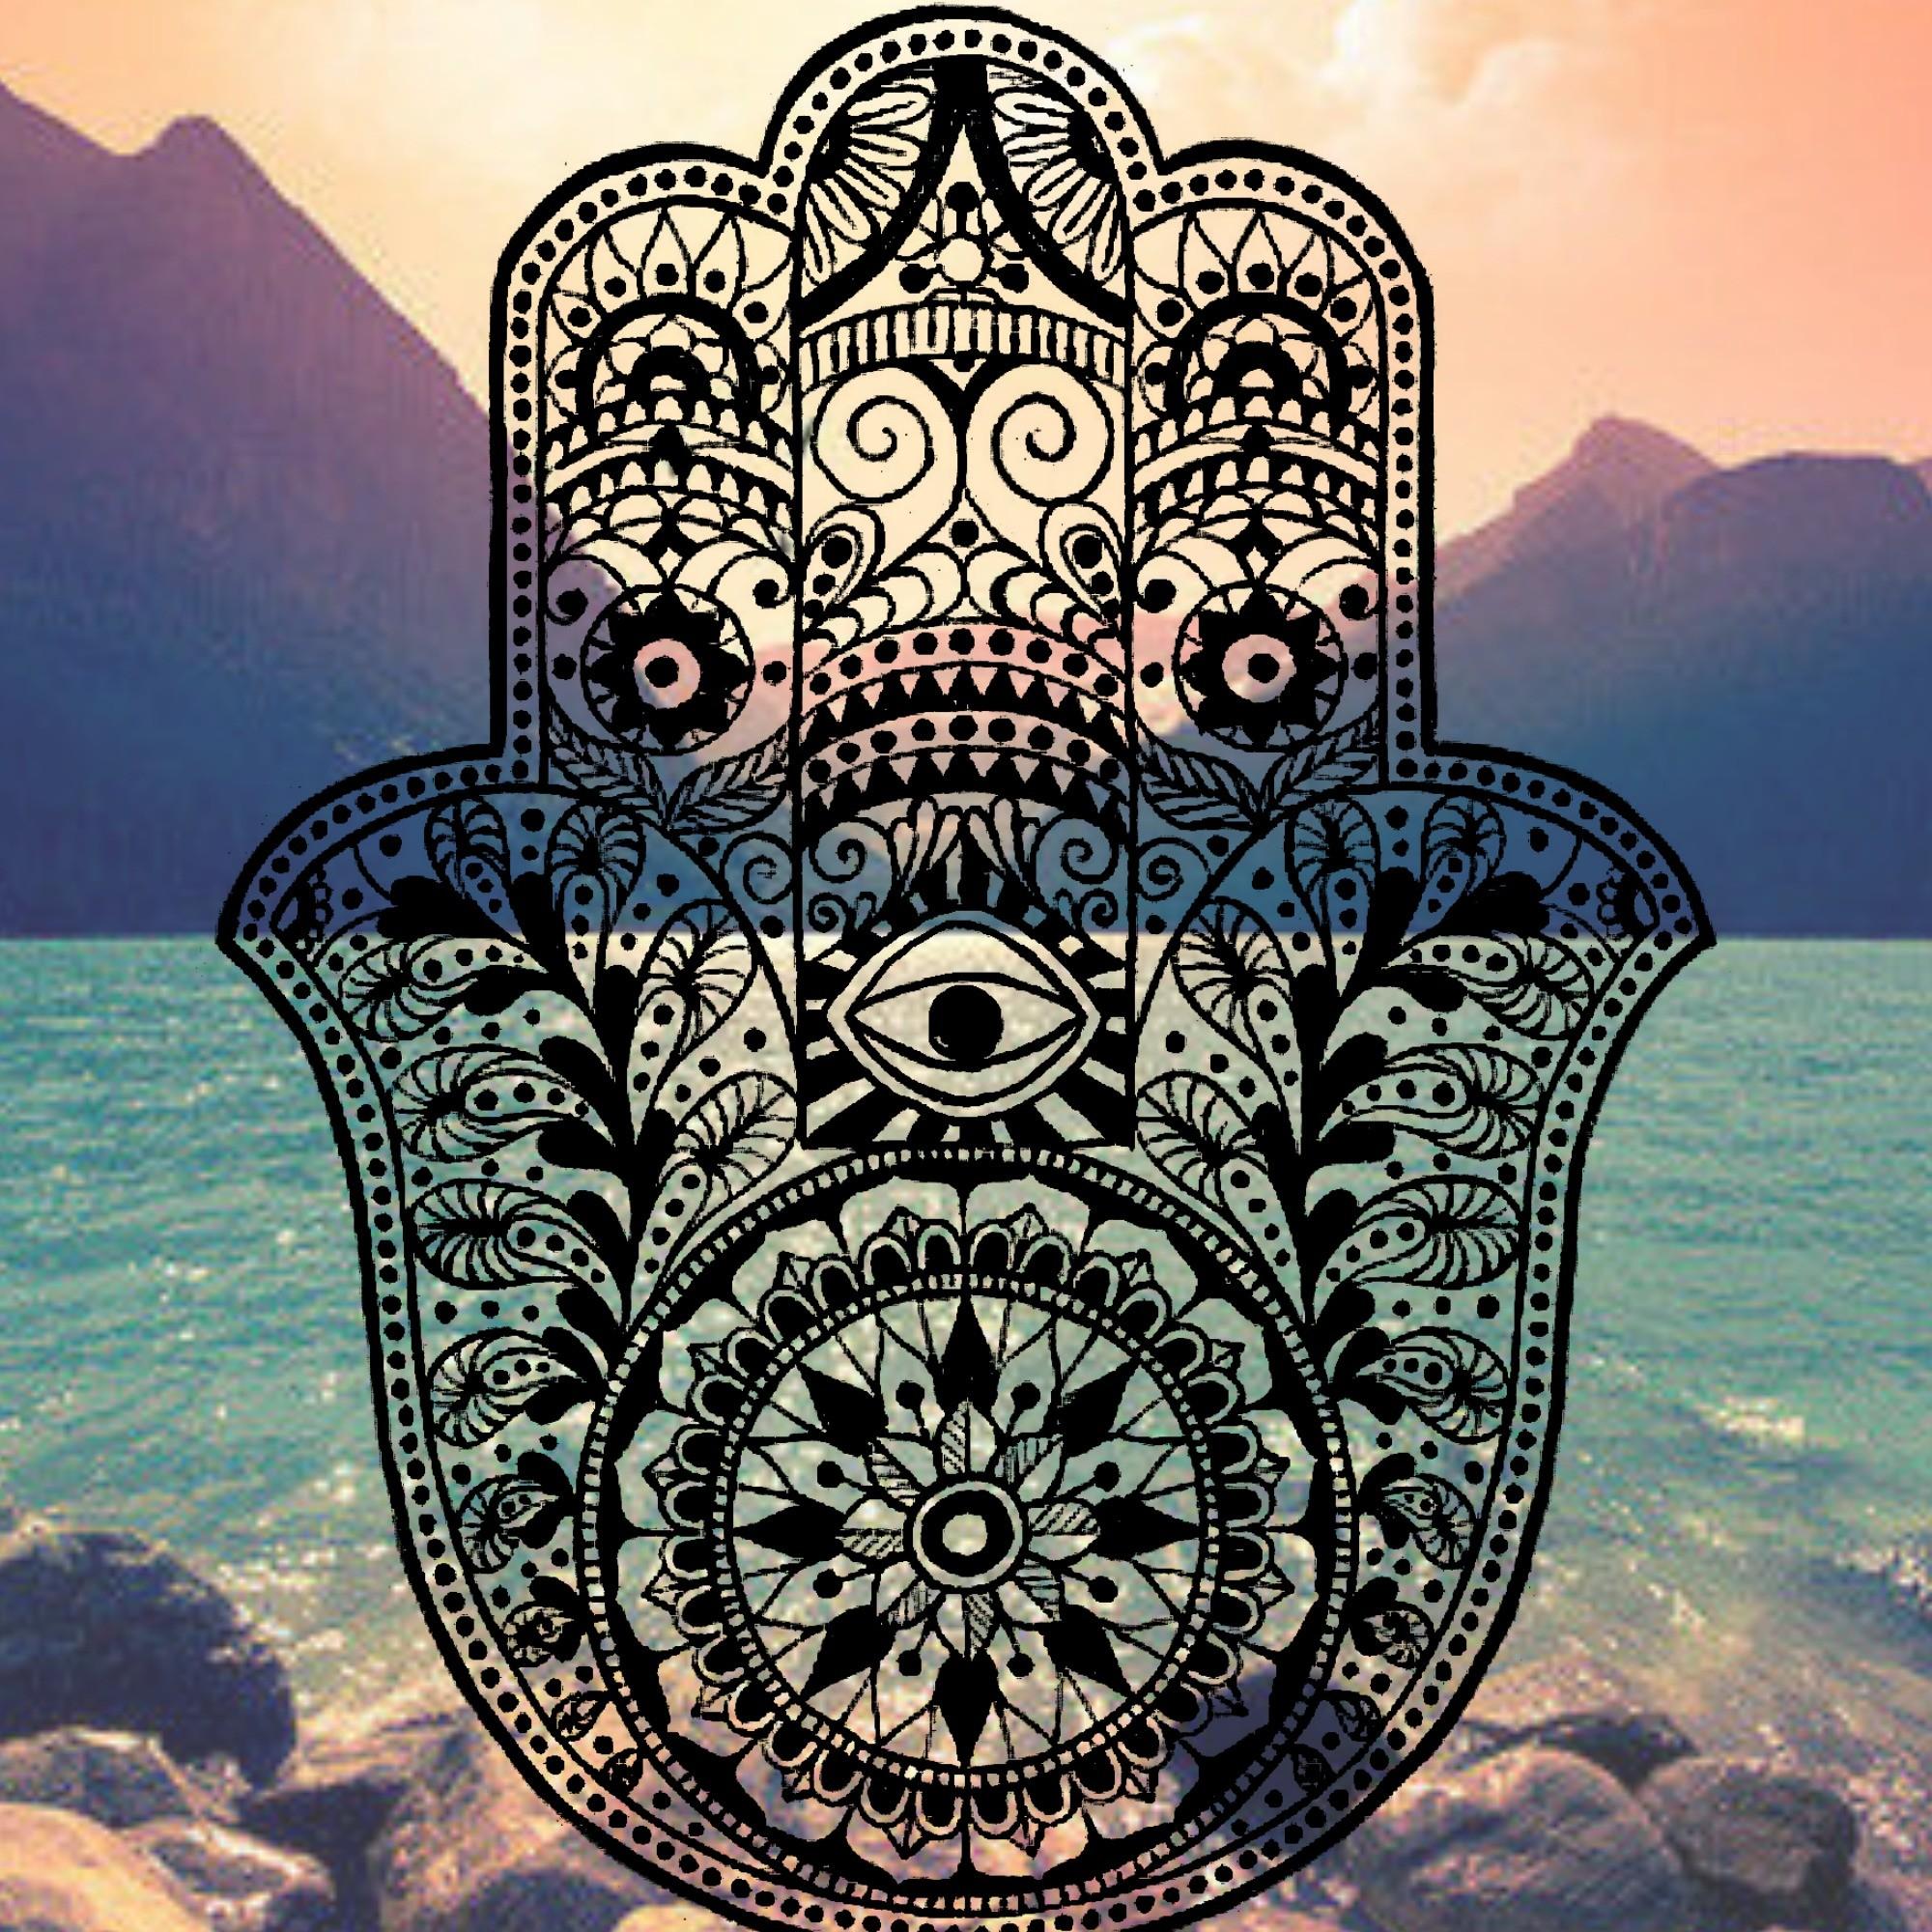 Henna Wallpaper: Mandala Wallpaper Desktop (61+ Images